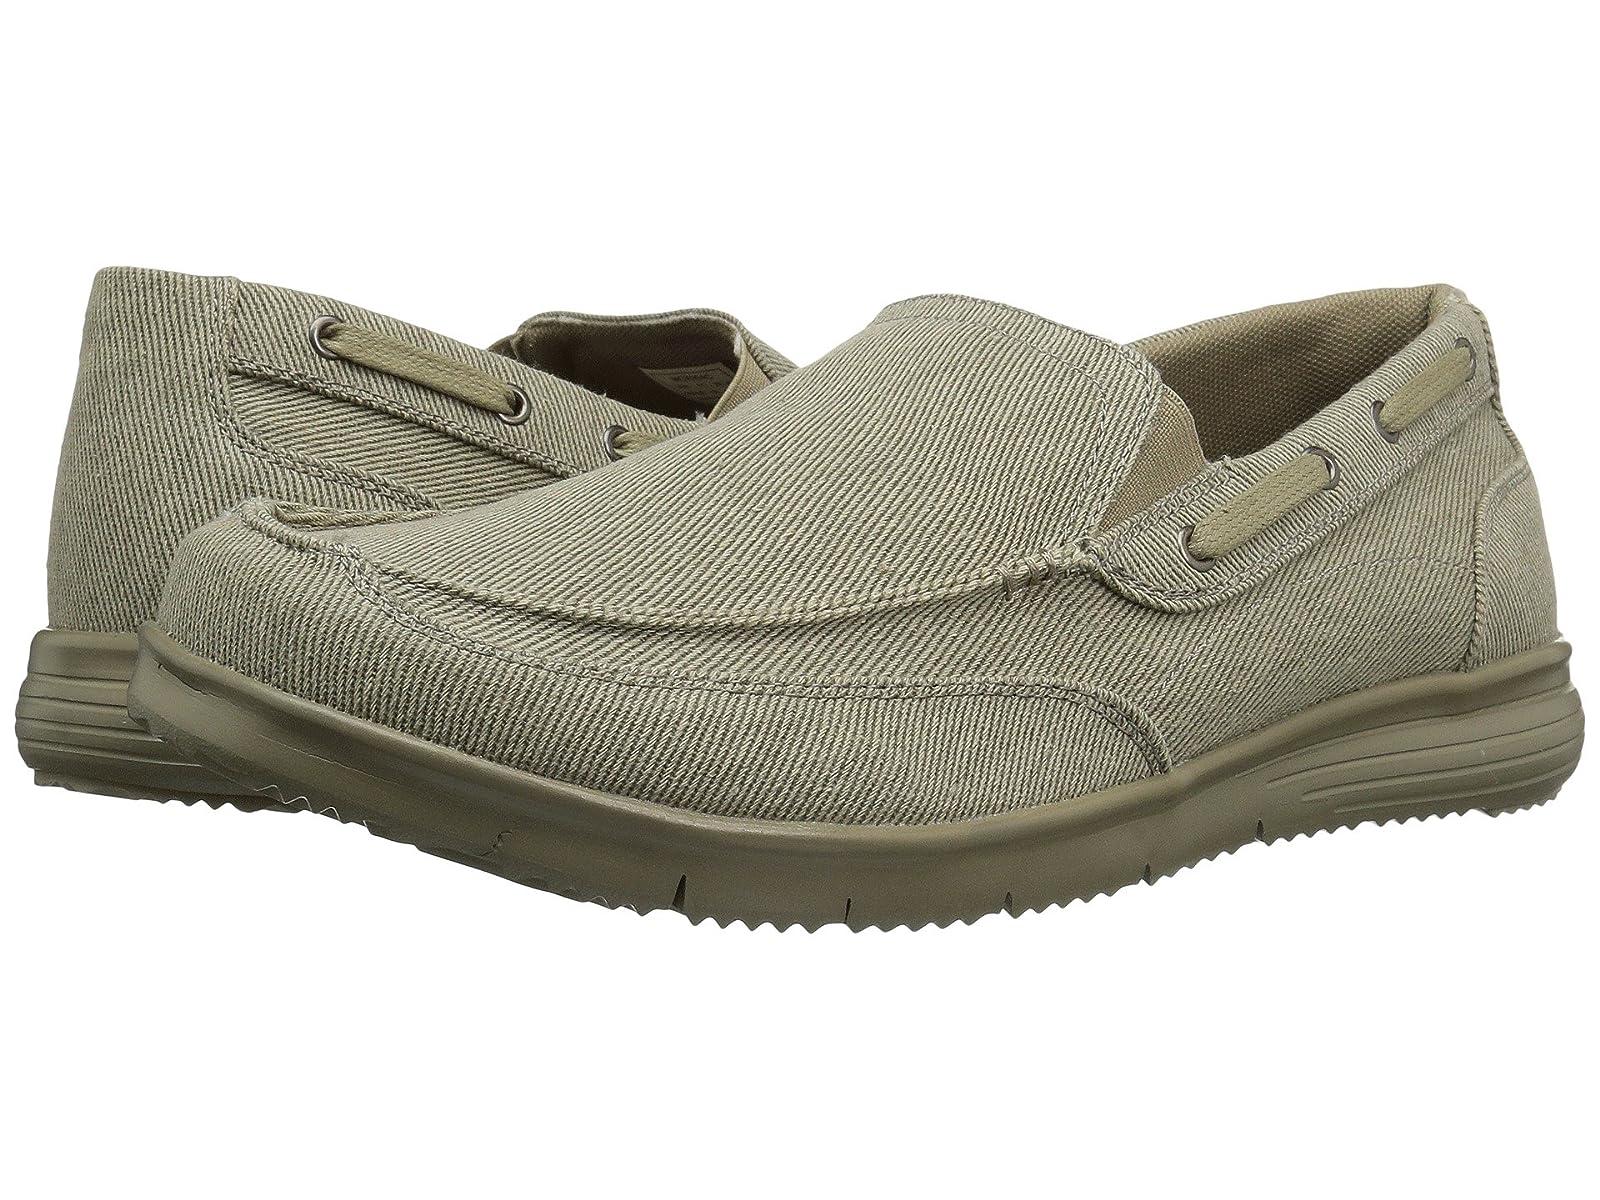 Propet SawyerSelling fashionable and eye-catching shoes